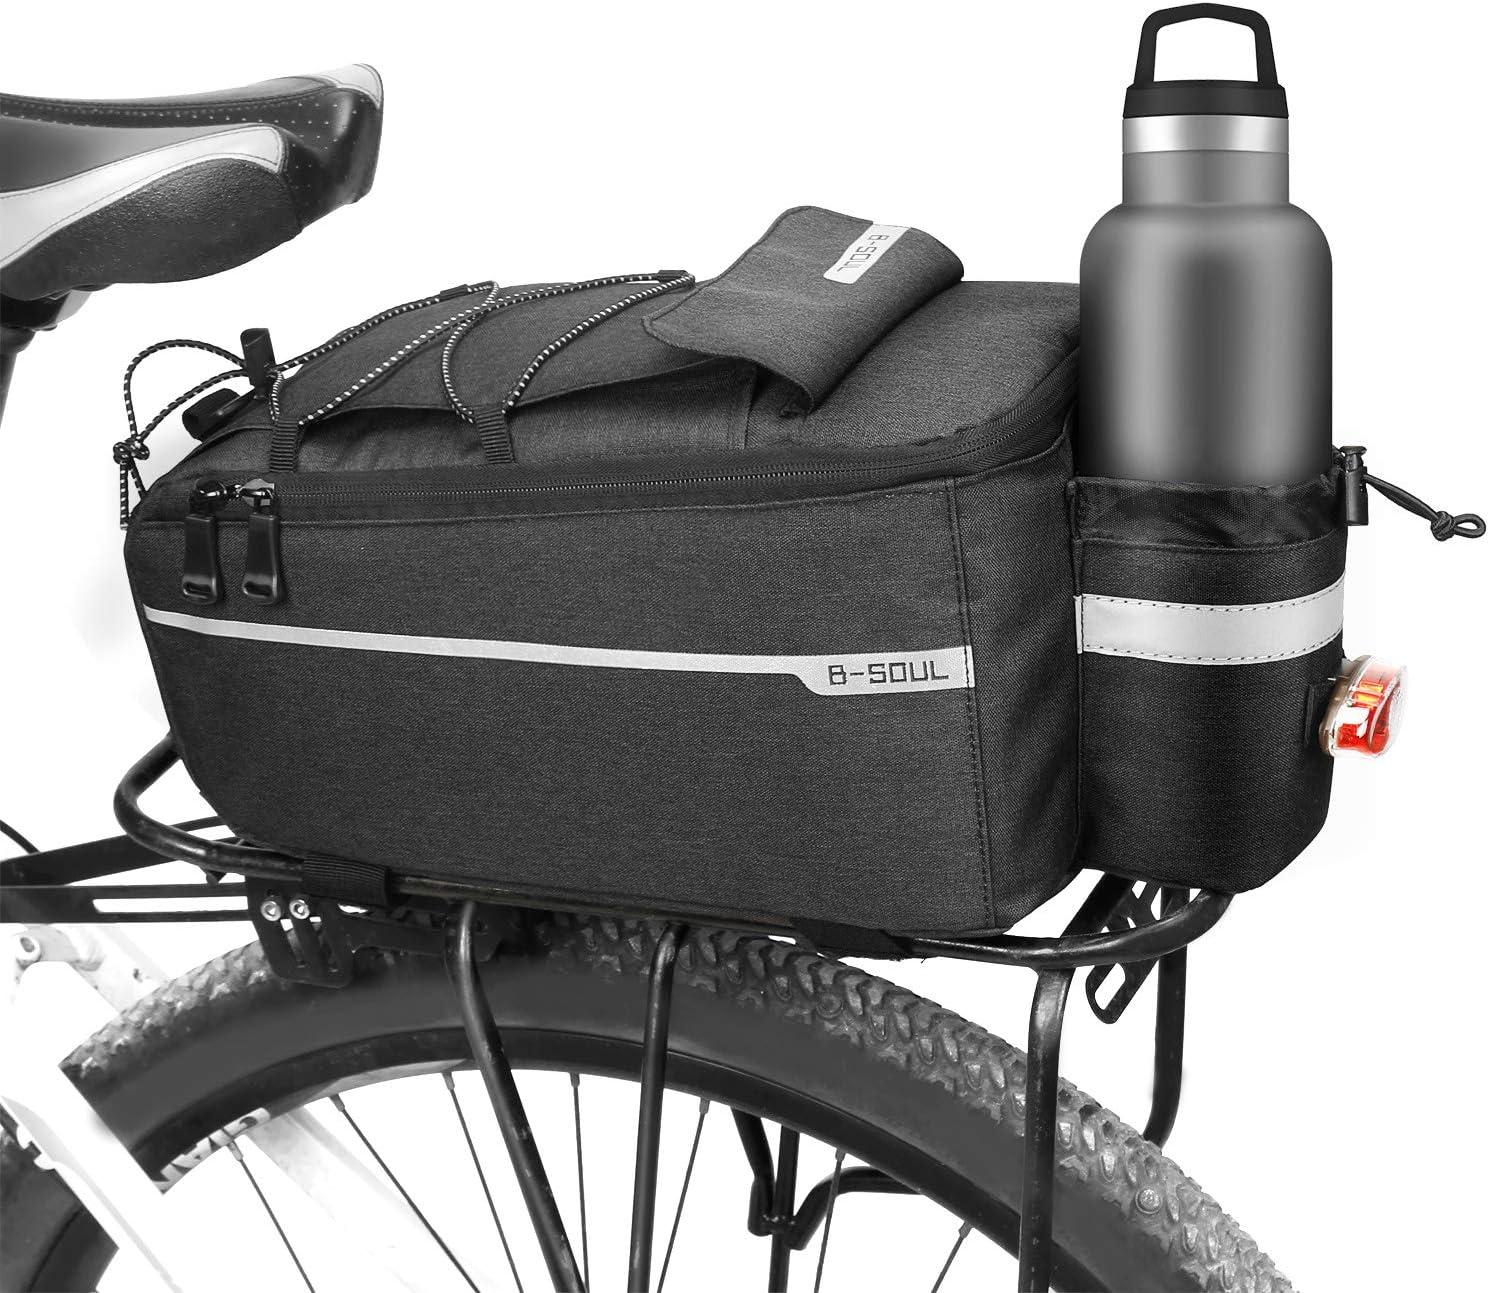 Jhua Bike Bags Rear Rack Bike Trunk Bag Waterproof 10L Bike Luggage Bag Insulated Bicycle Rack Rear Carrier Bag for Back of Bike Rack Reflective MTB Bicycle Commuter Bag Pannier Shoulder Bag, Black